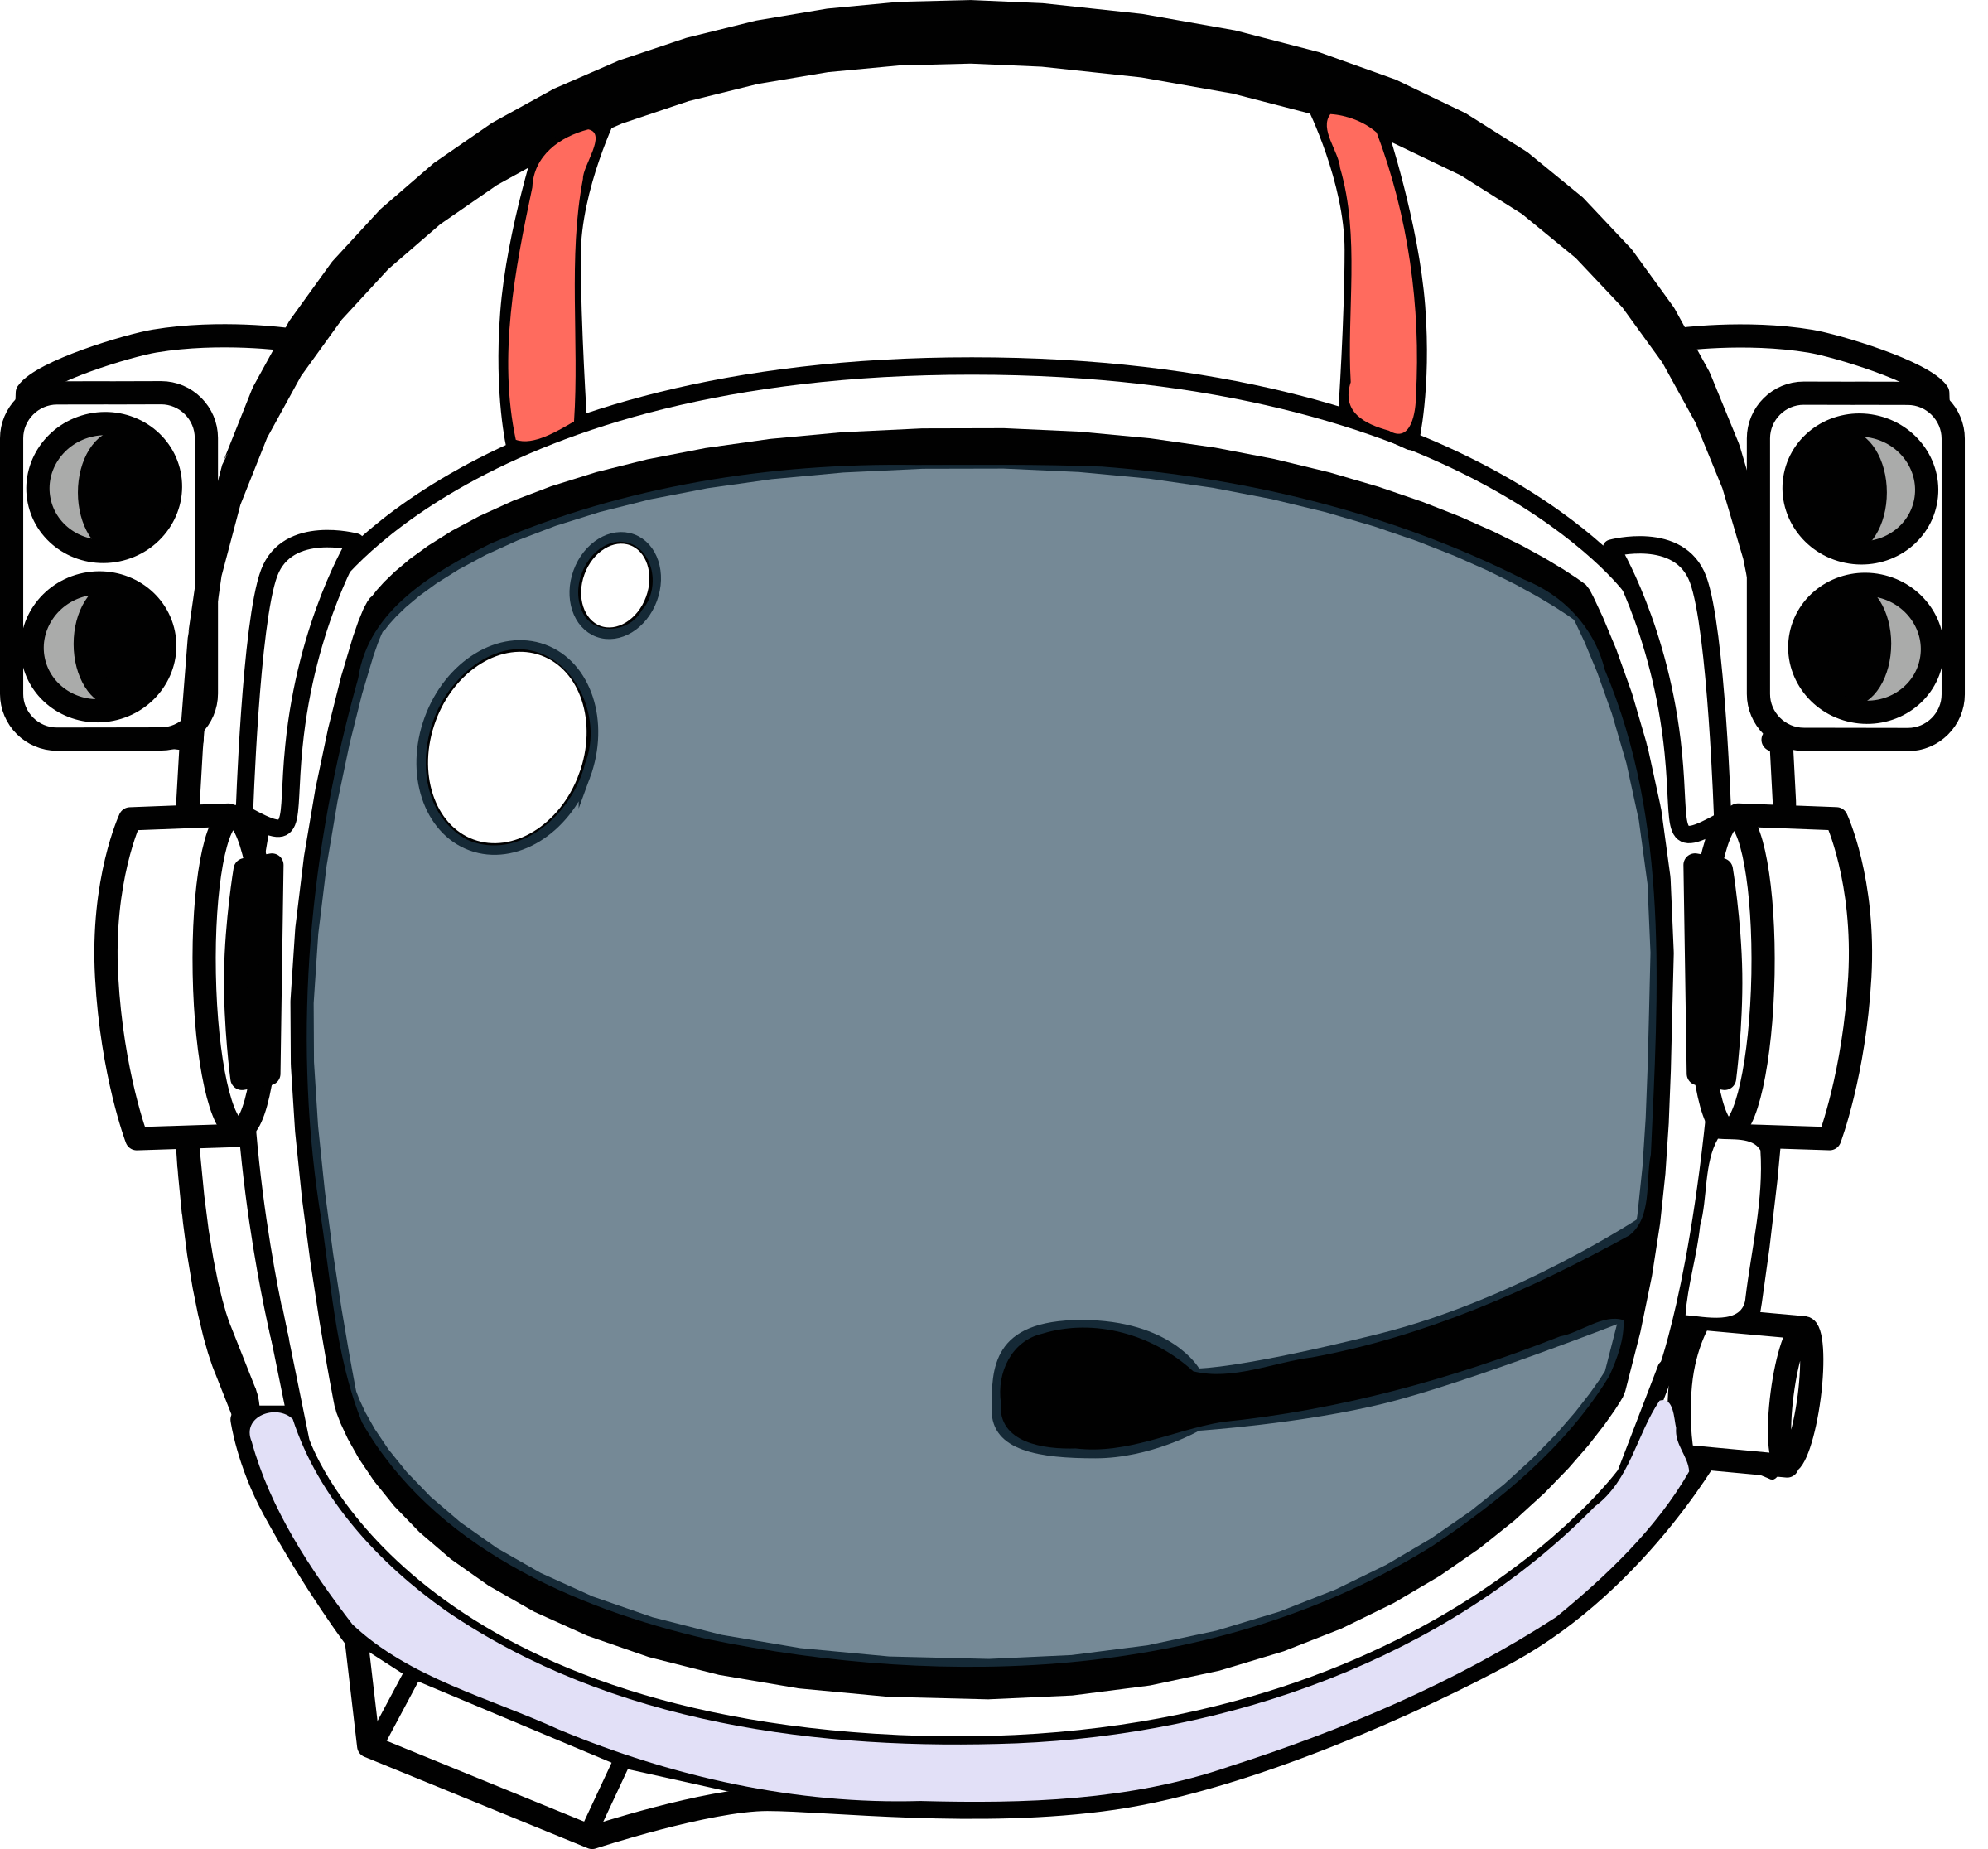 Clipart. Space helmet png